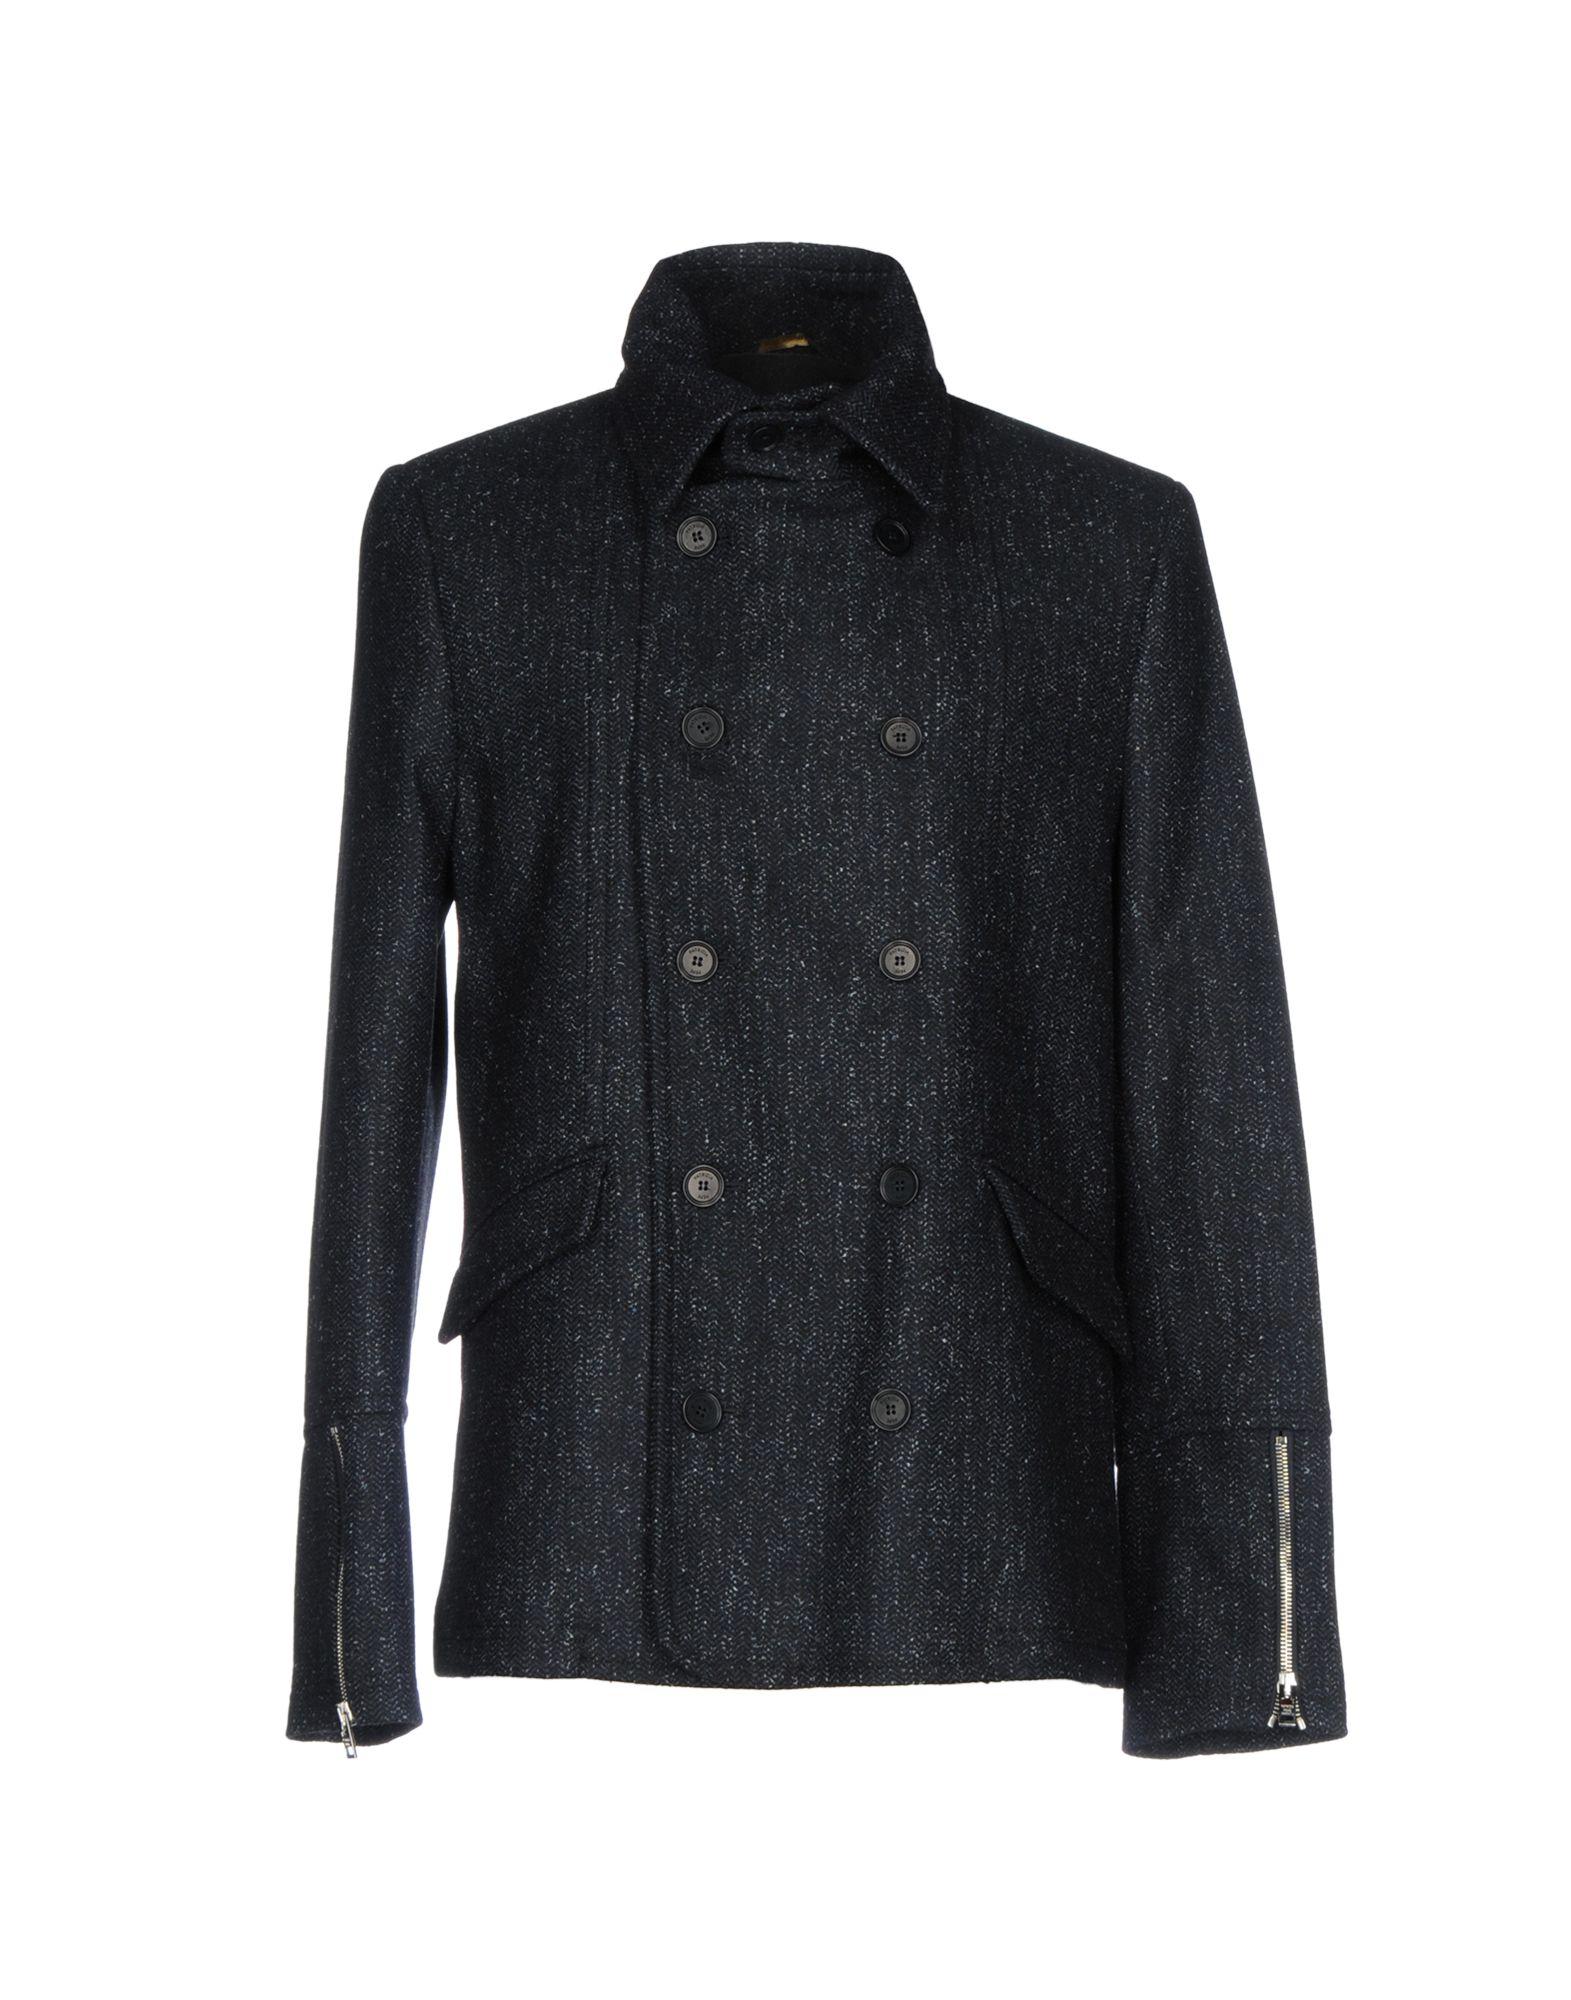 PATRIZIA PEPE Пальто 2016 осенью дамы сукно slim шерстяные пальто в длинные пальто